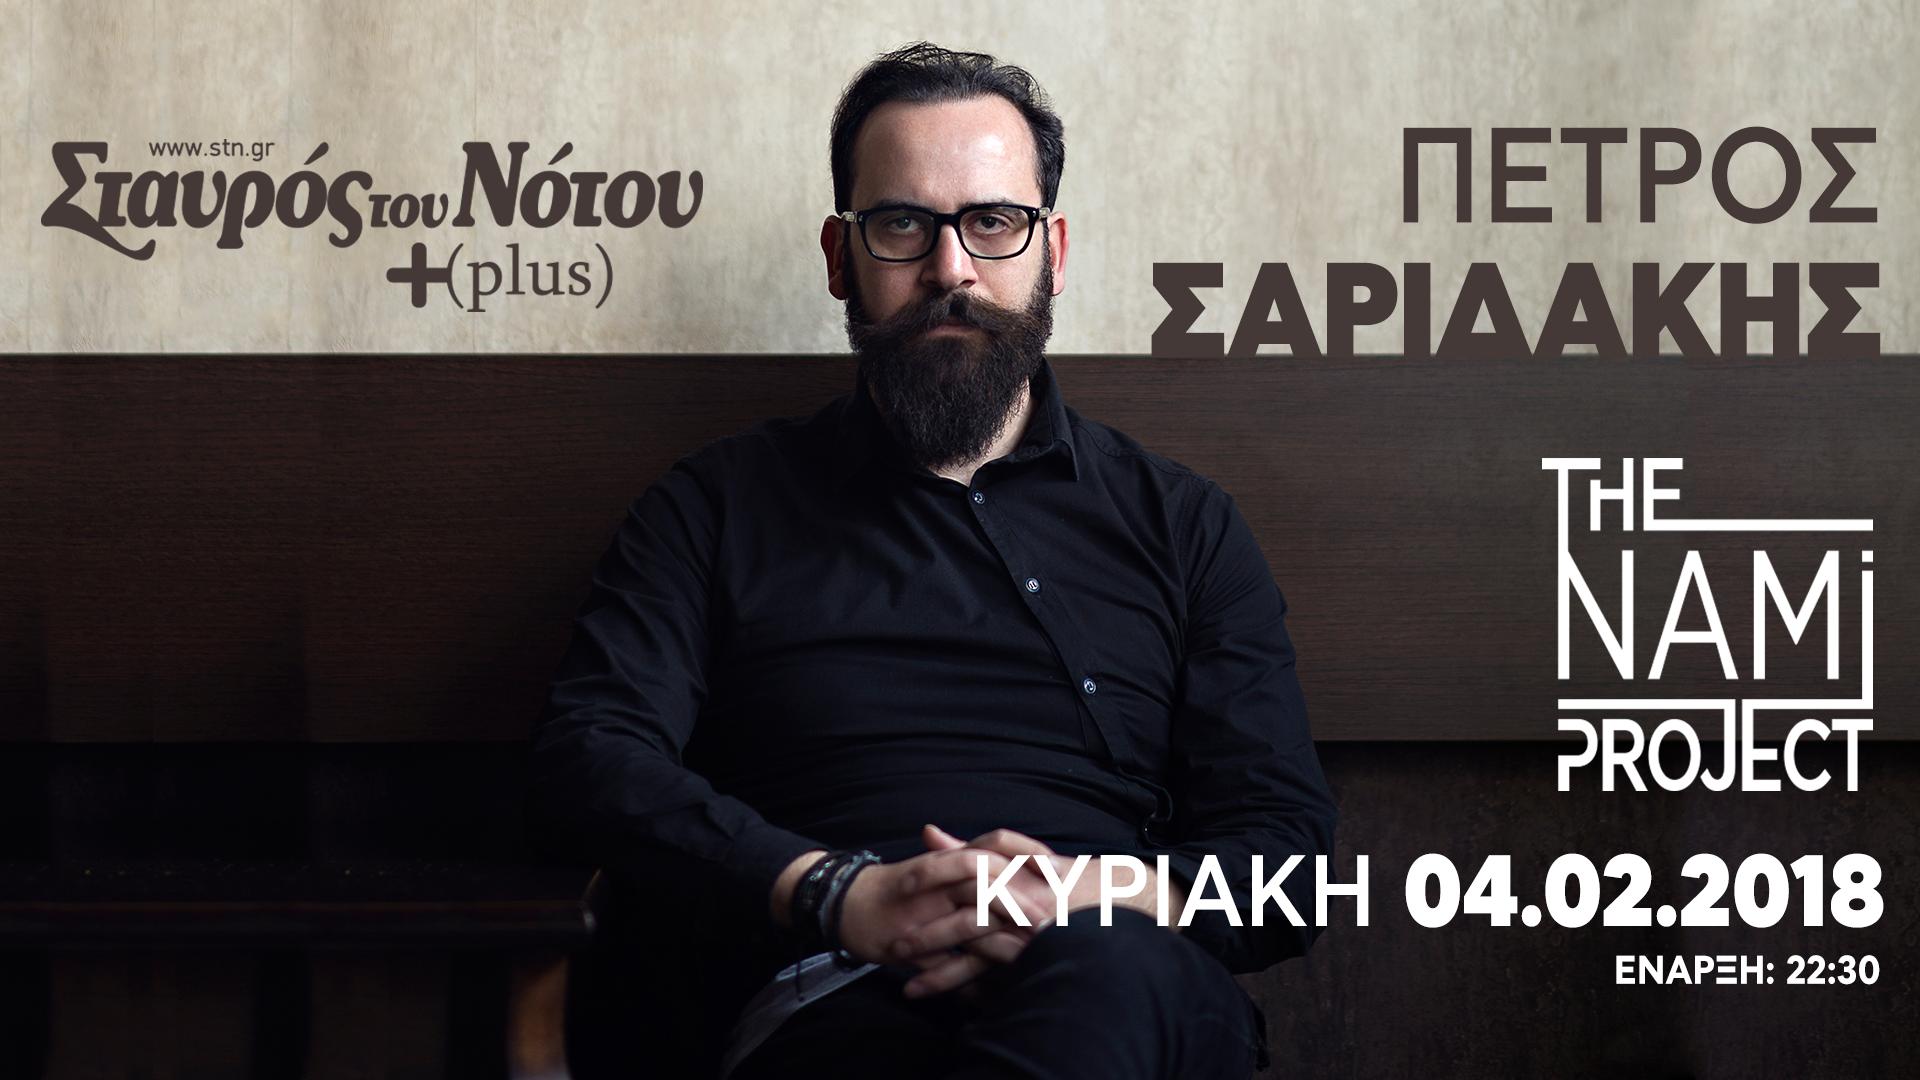 Saridakis_StavrosTouNotou_ΕVENT_Cover